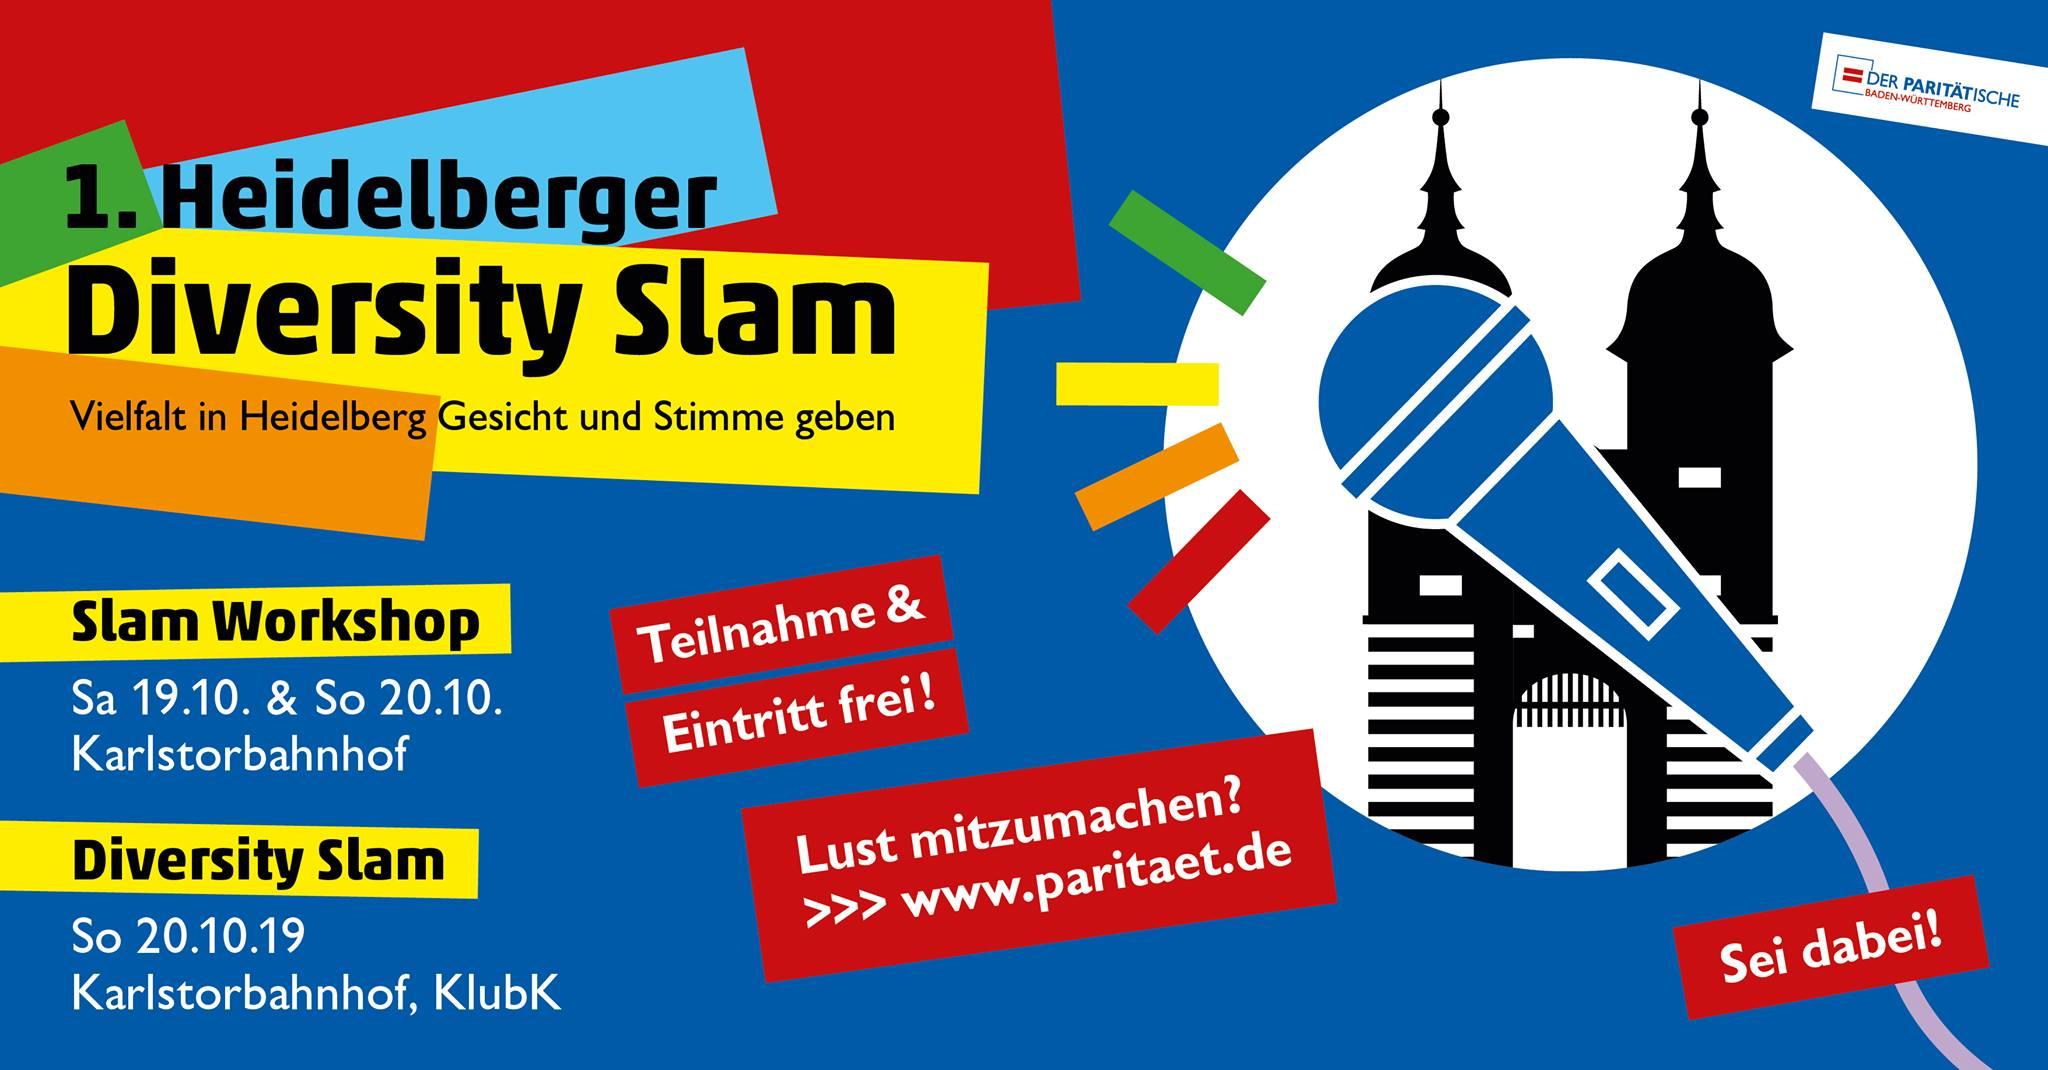 Diversity Slam am 10.10.19